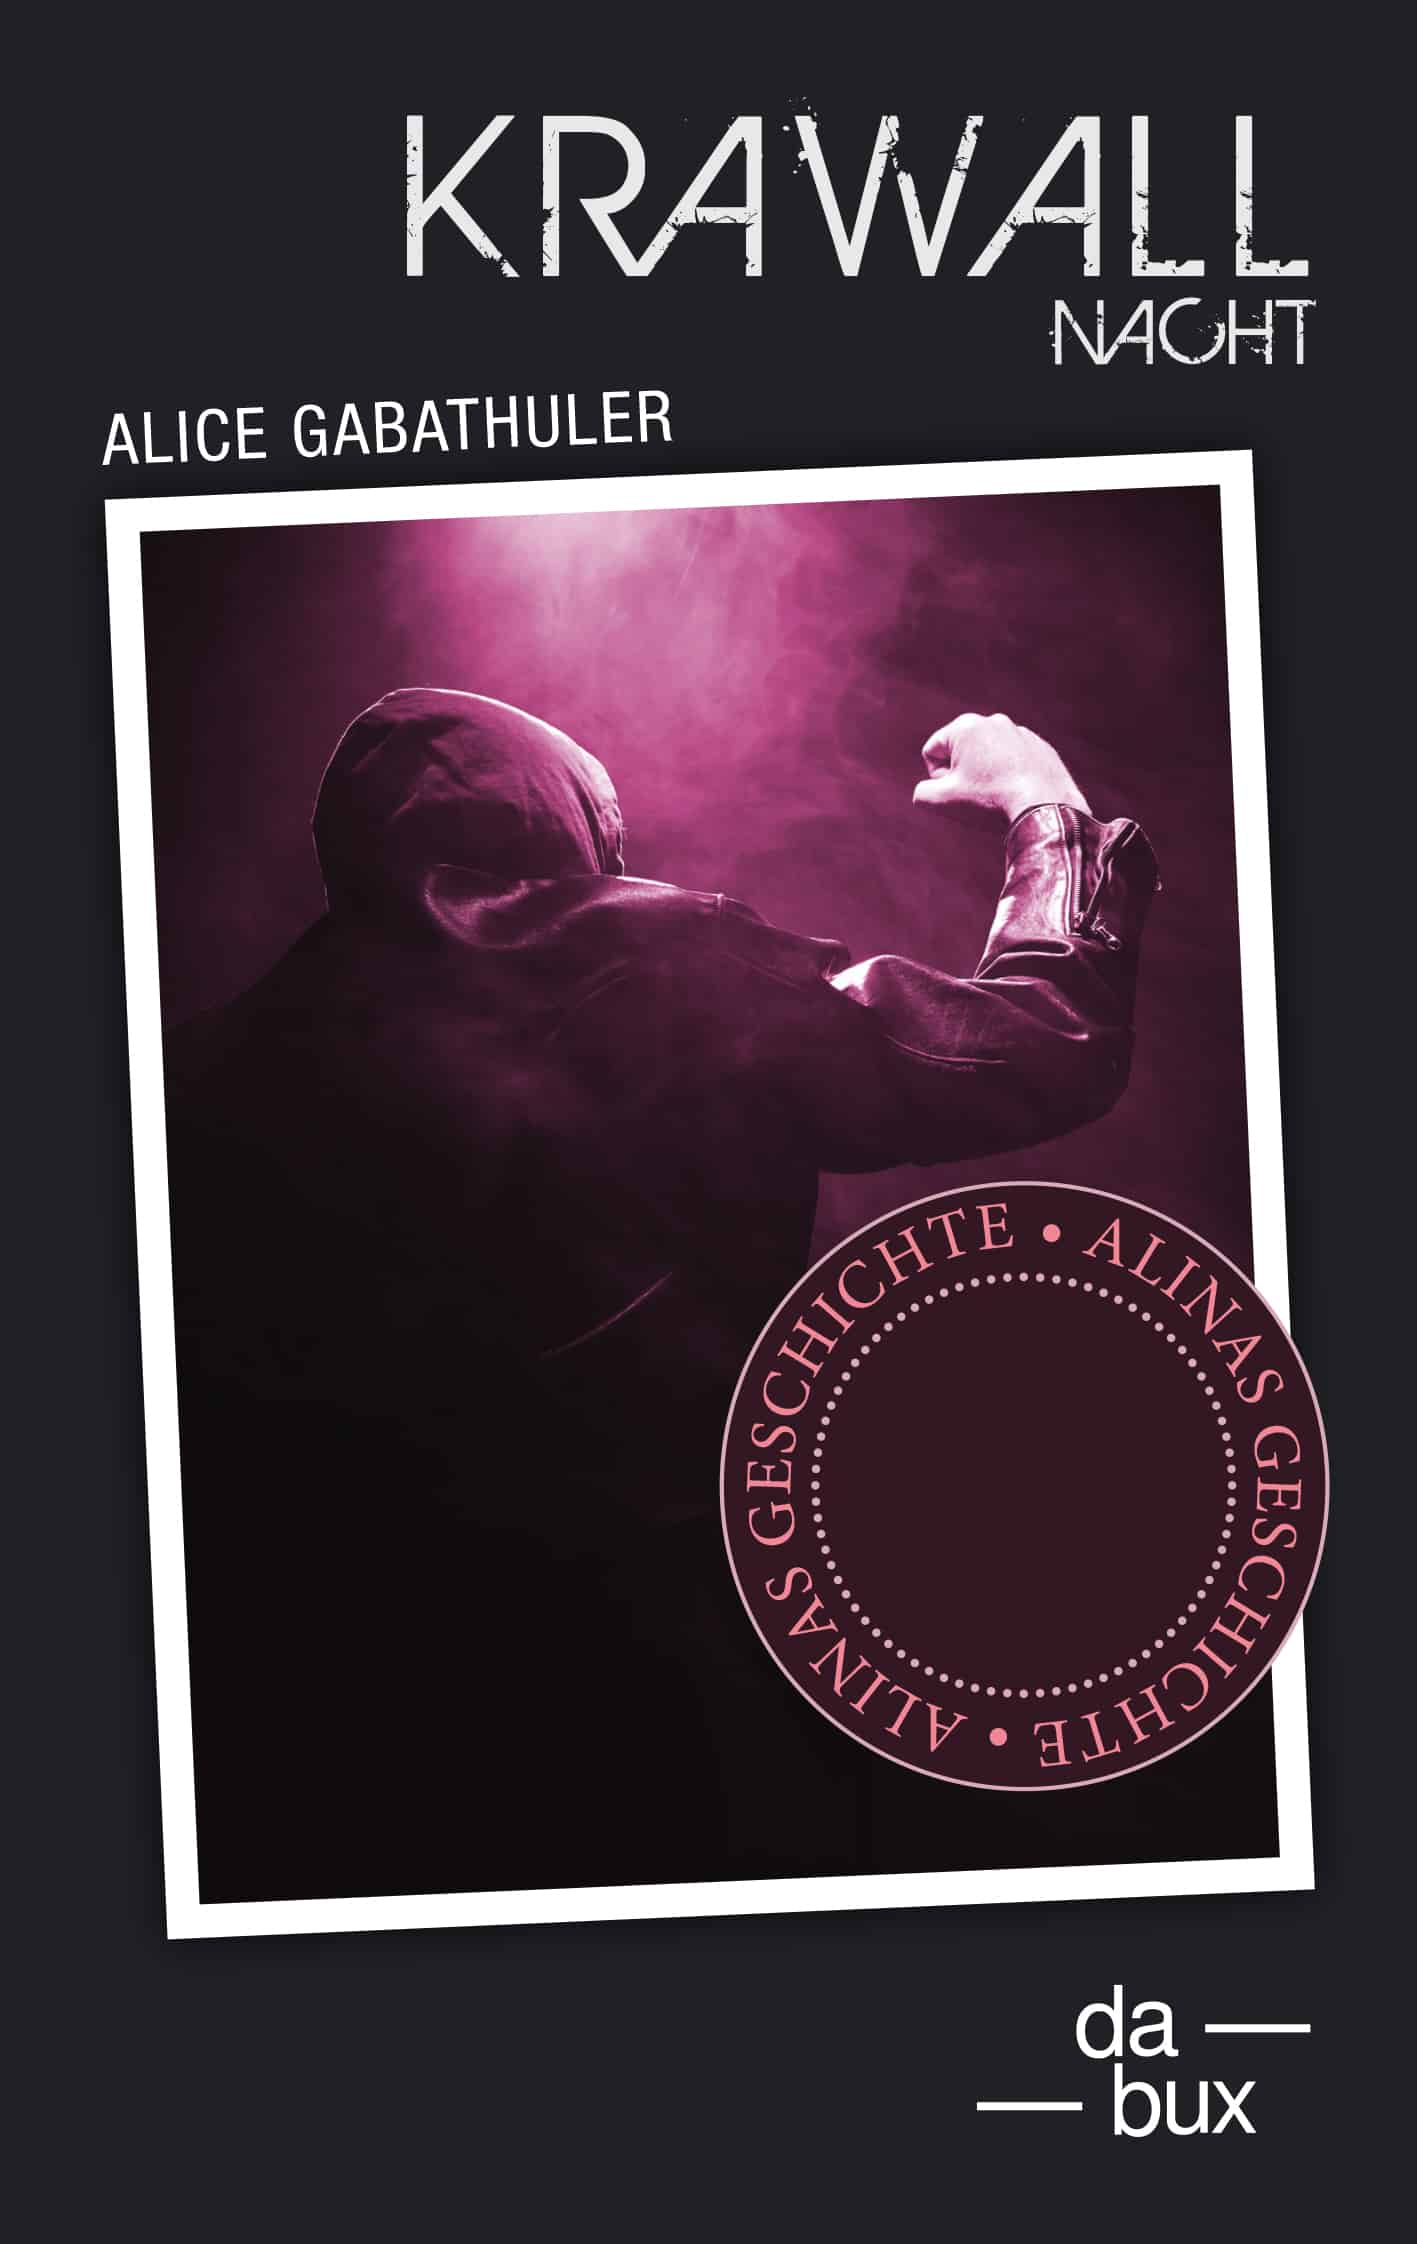 Krawallnacht - Alina Alice Gabathuler